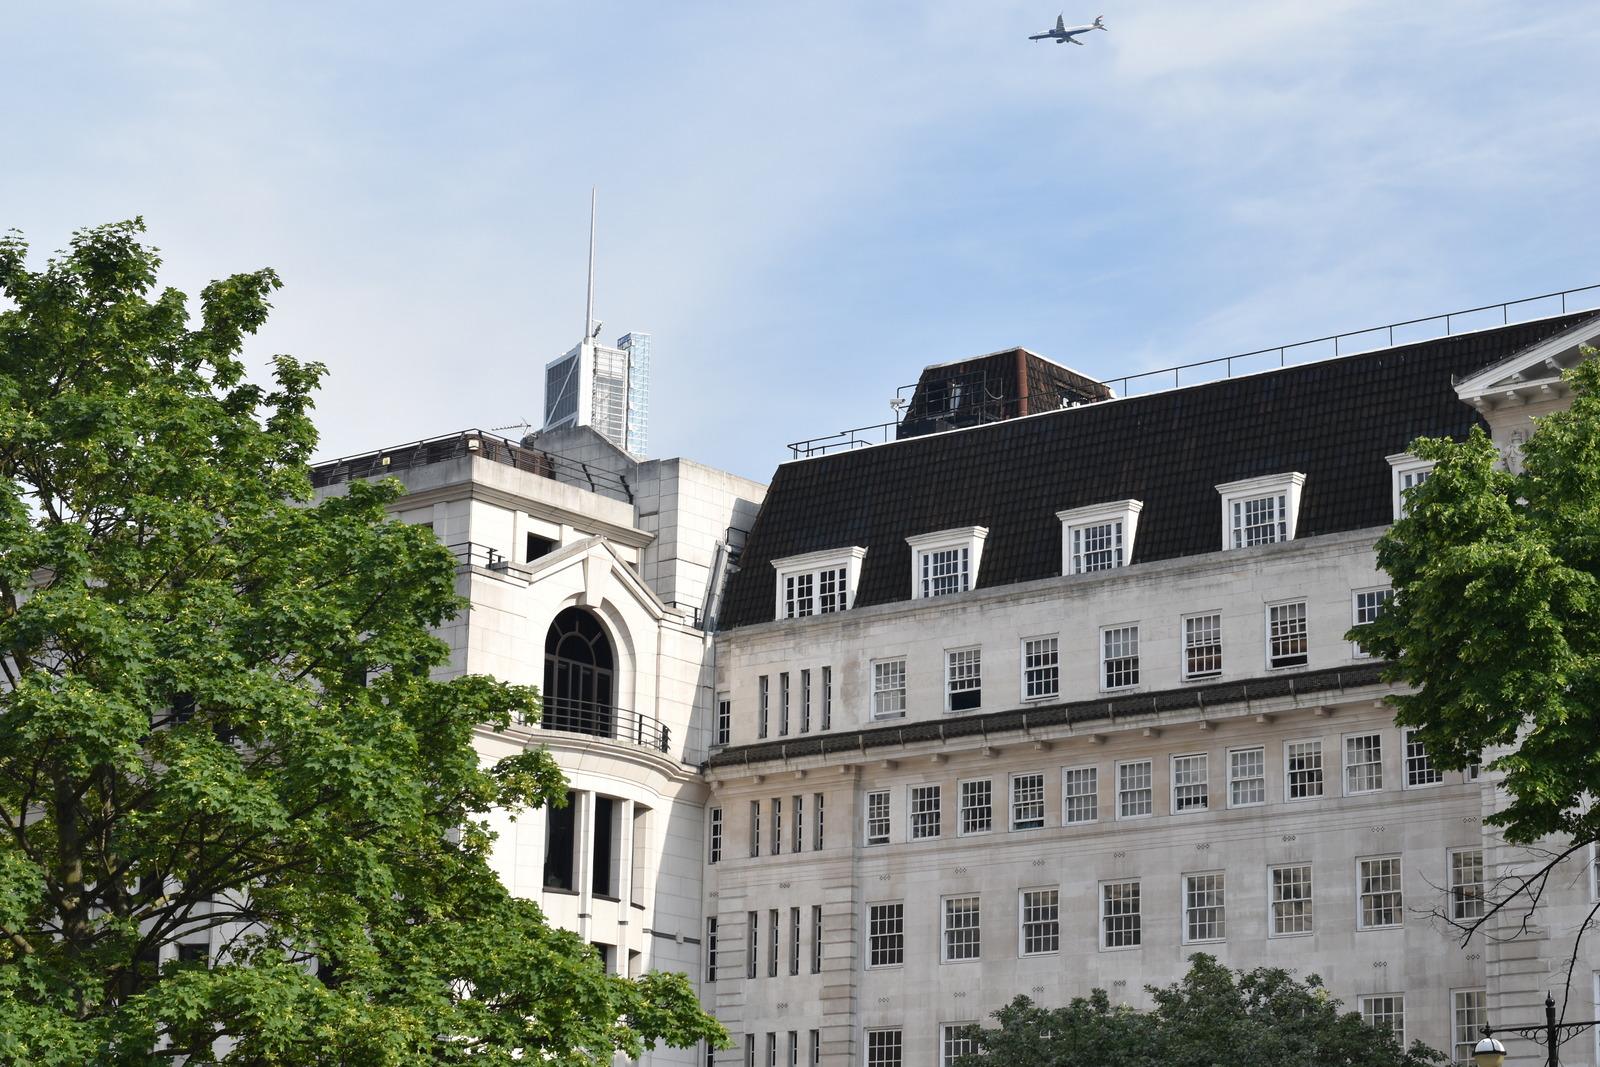 Days 1-2: London (19 photos)